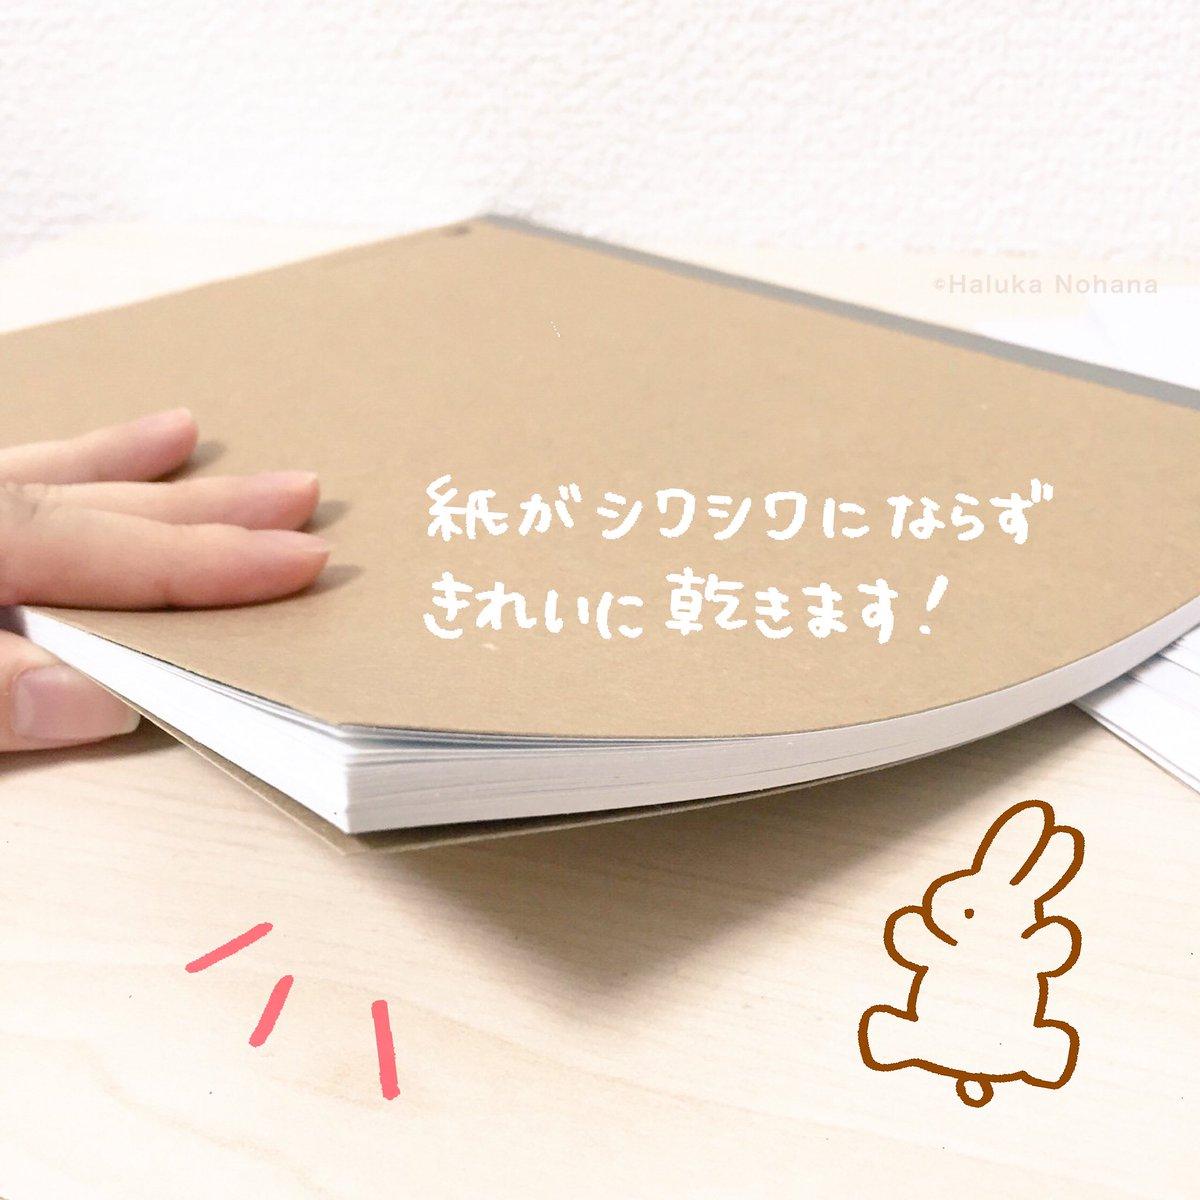 haruka-nohana-diy-fix-wet-book-pages-5